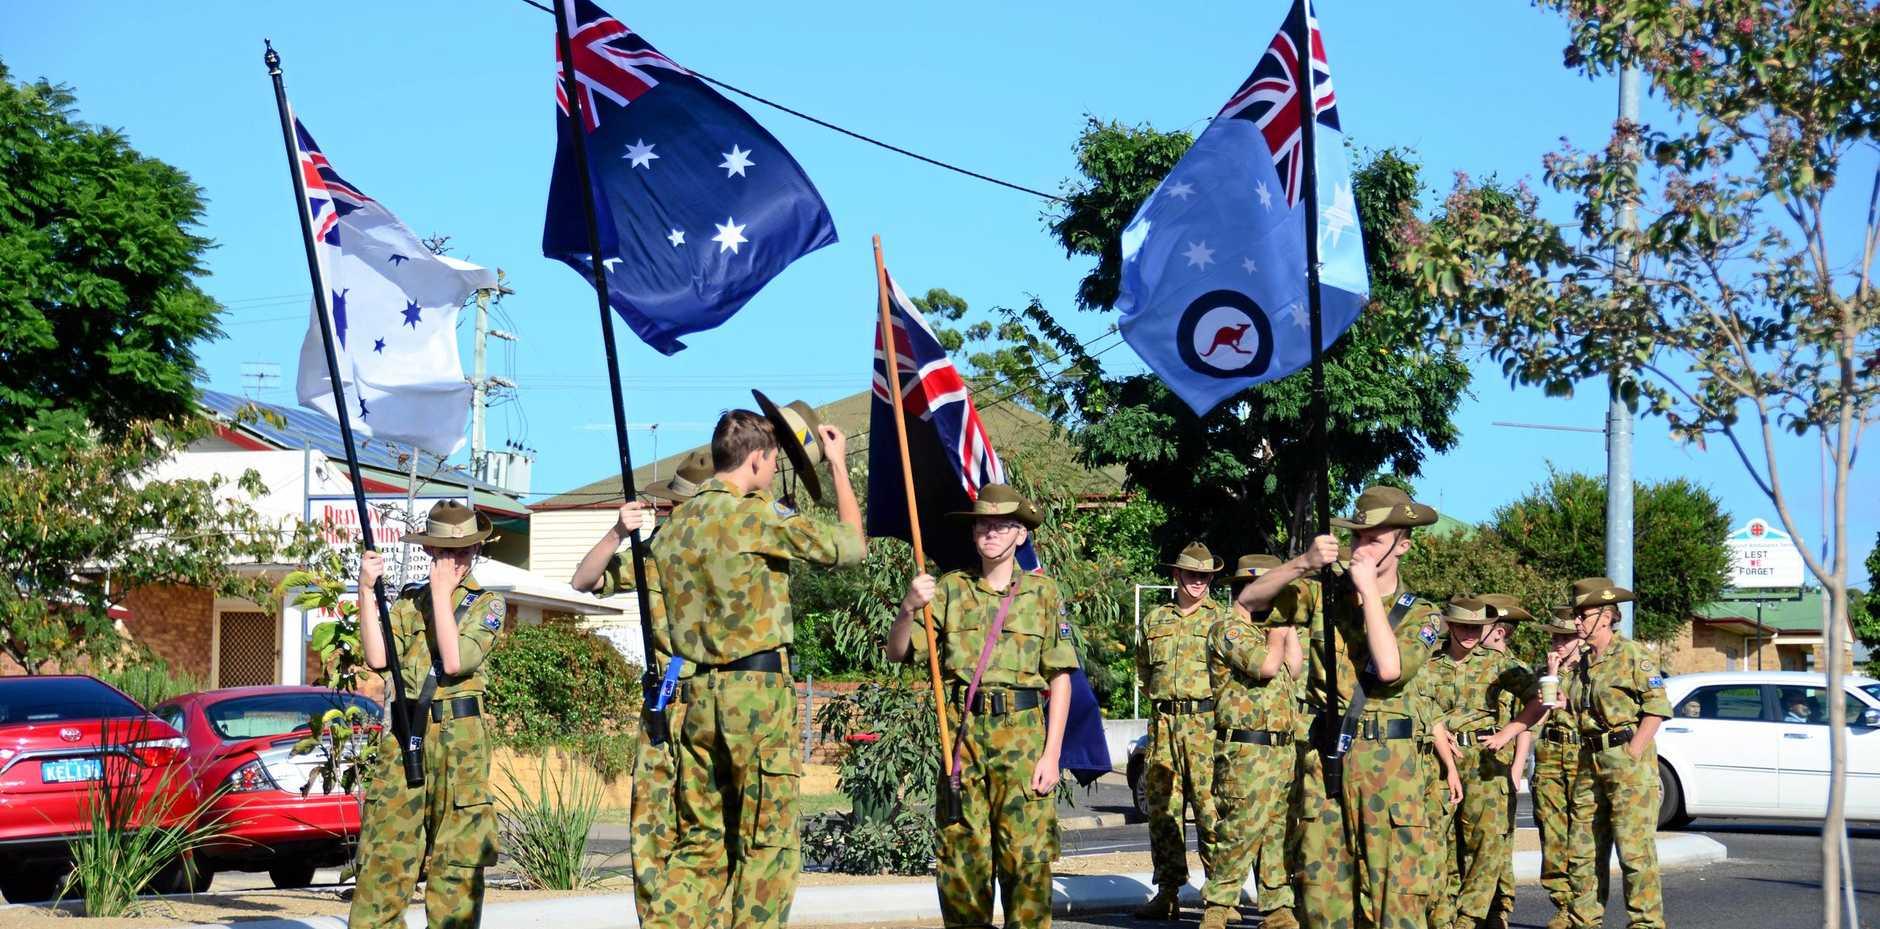 Army Cadet Nanango unit leading the 2016 Anzac Day march at Nanango. Photo Keagan Elder / South Burnett Times